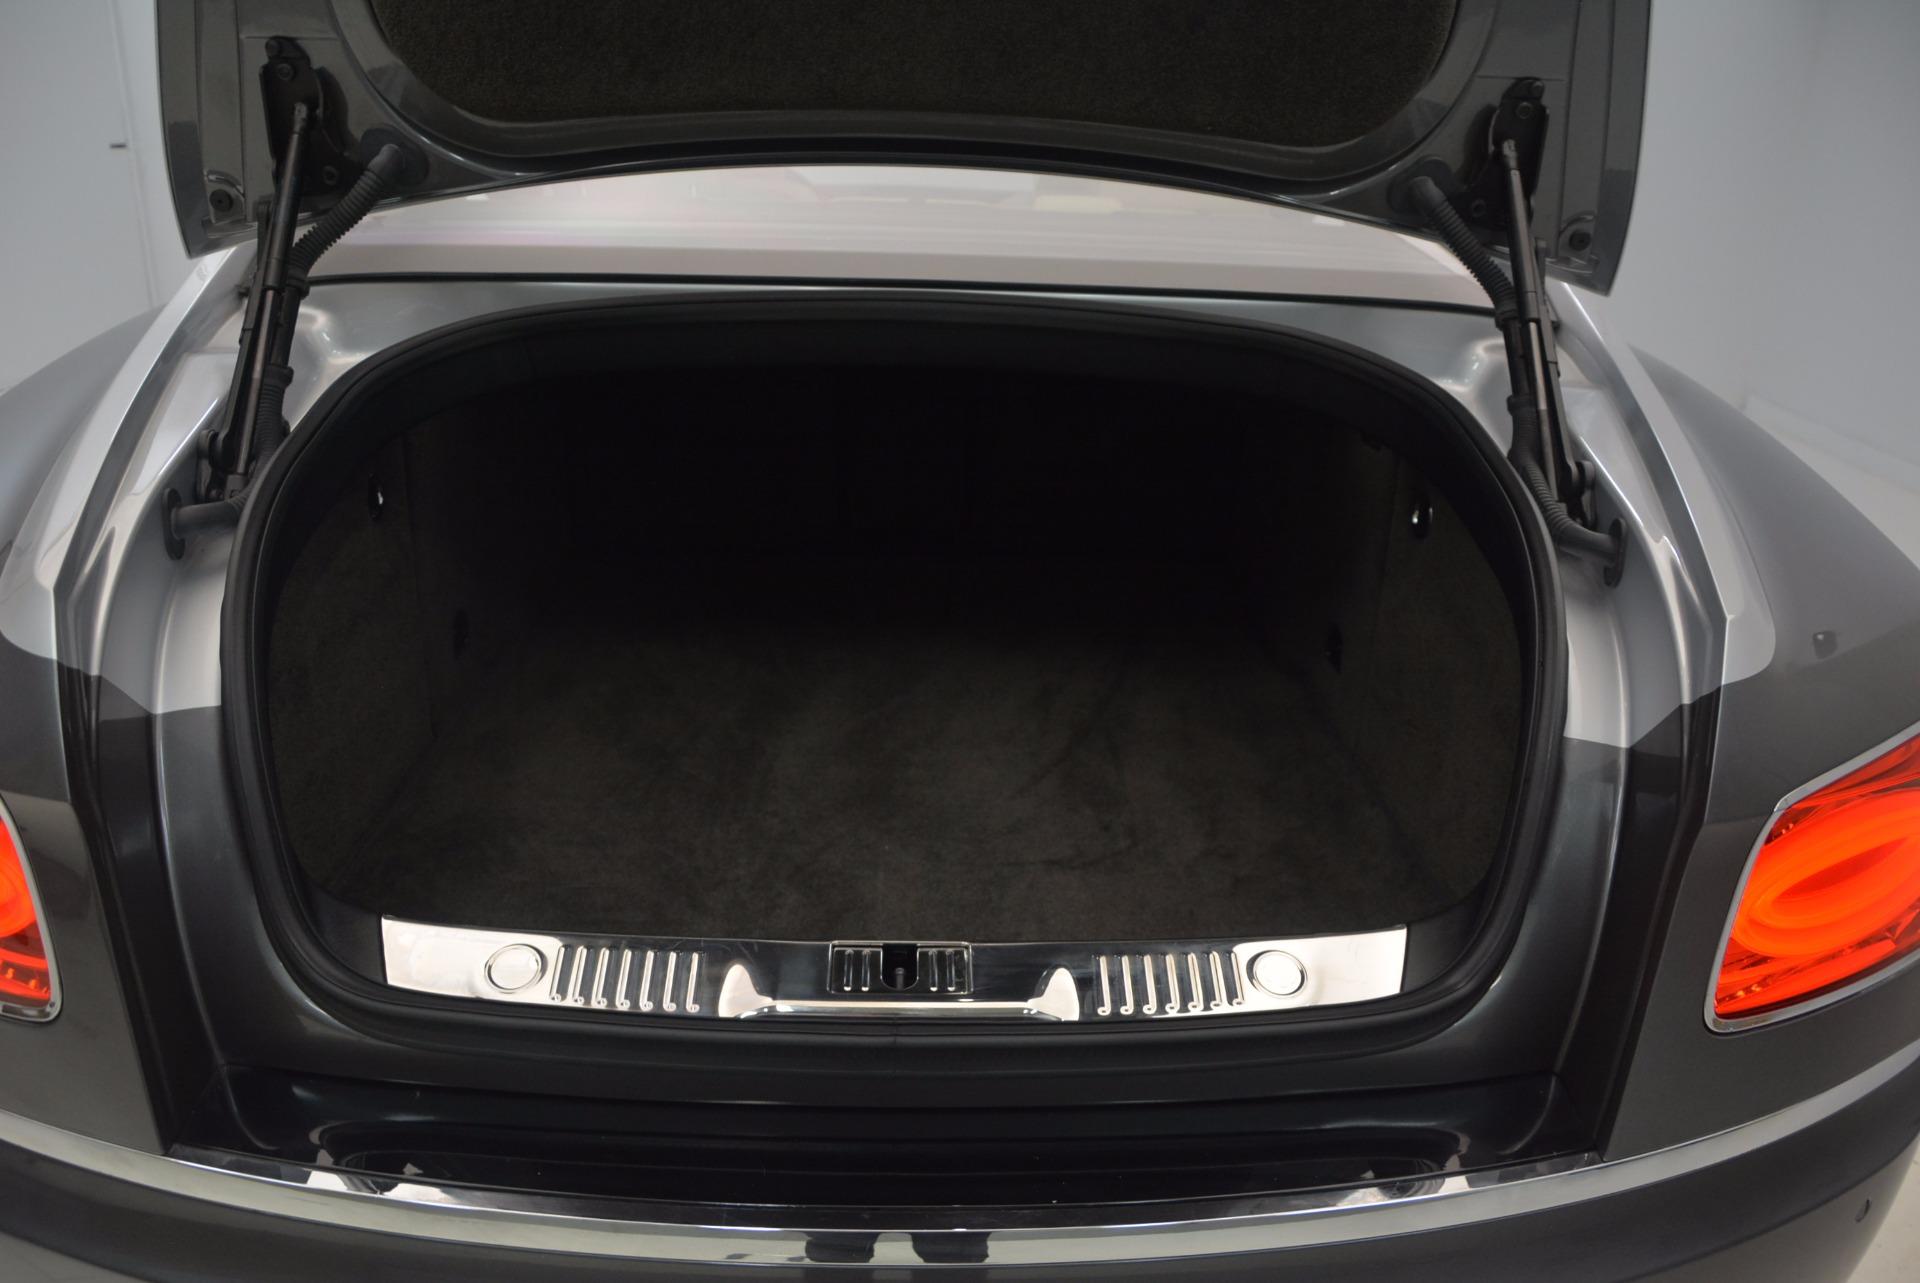 Used 2015 Bentley Flying Spur W12 For Sale In Westport, CT 1582_p32